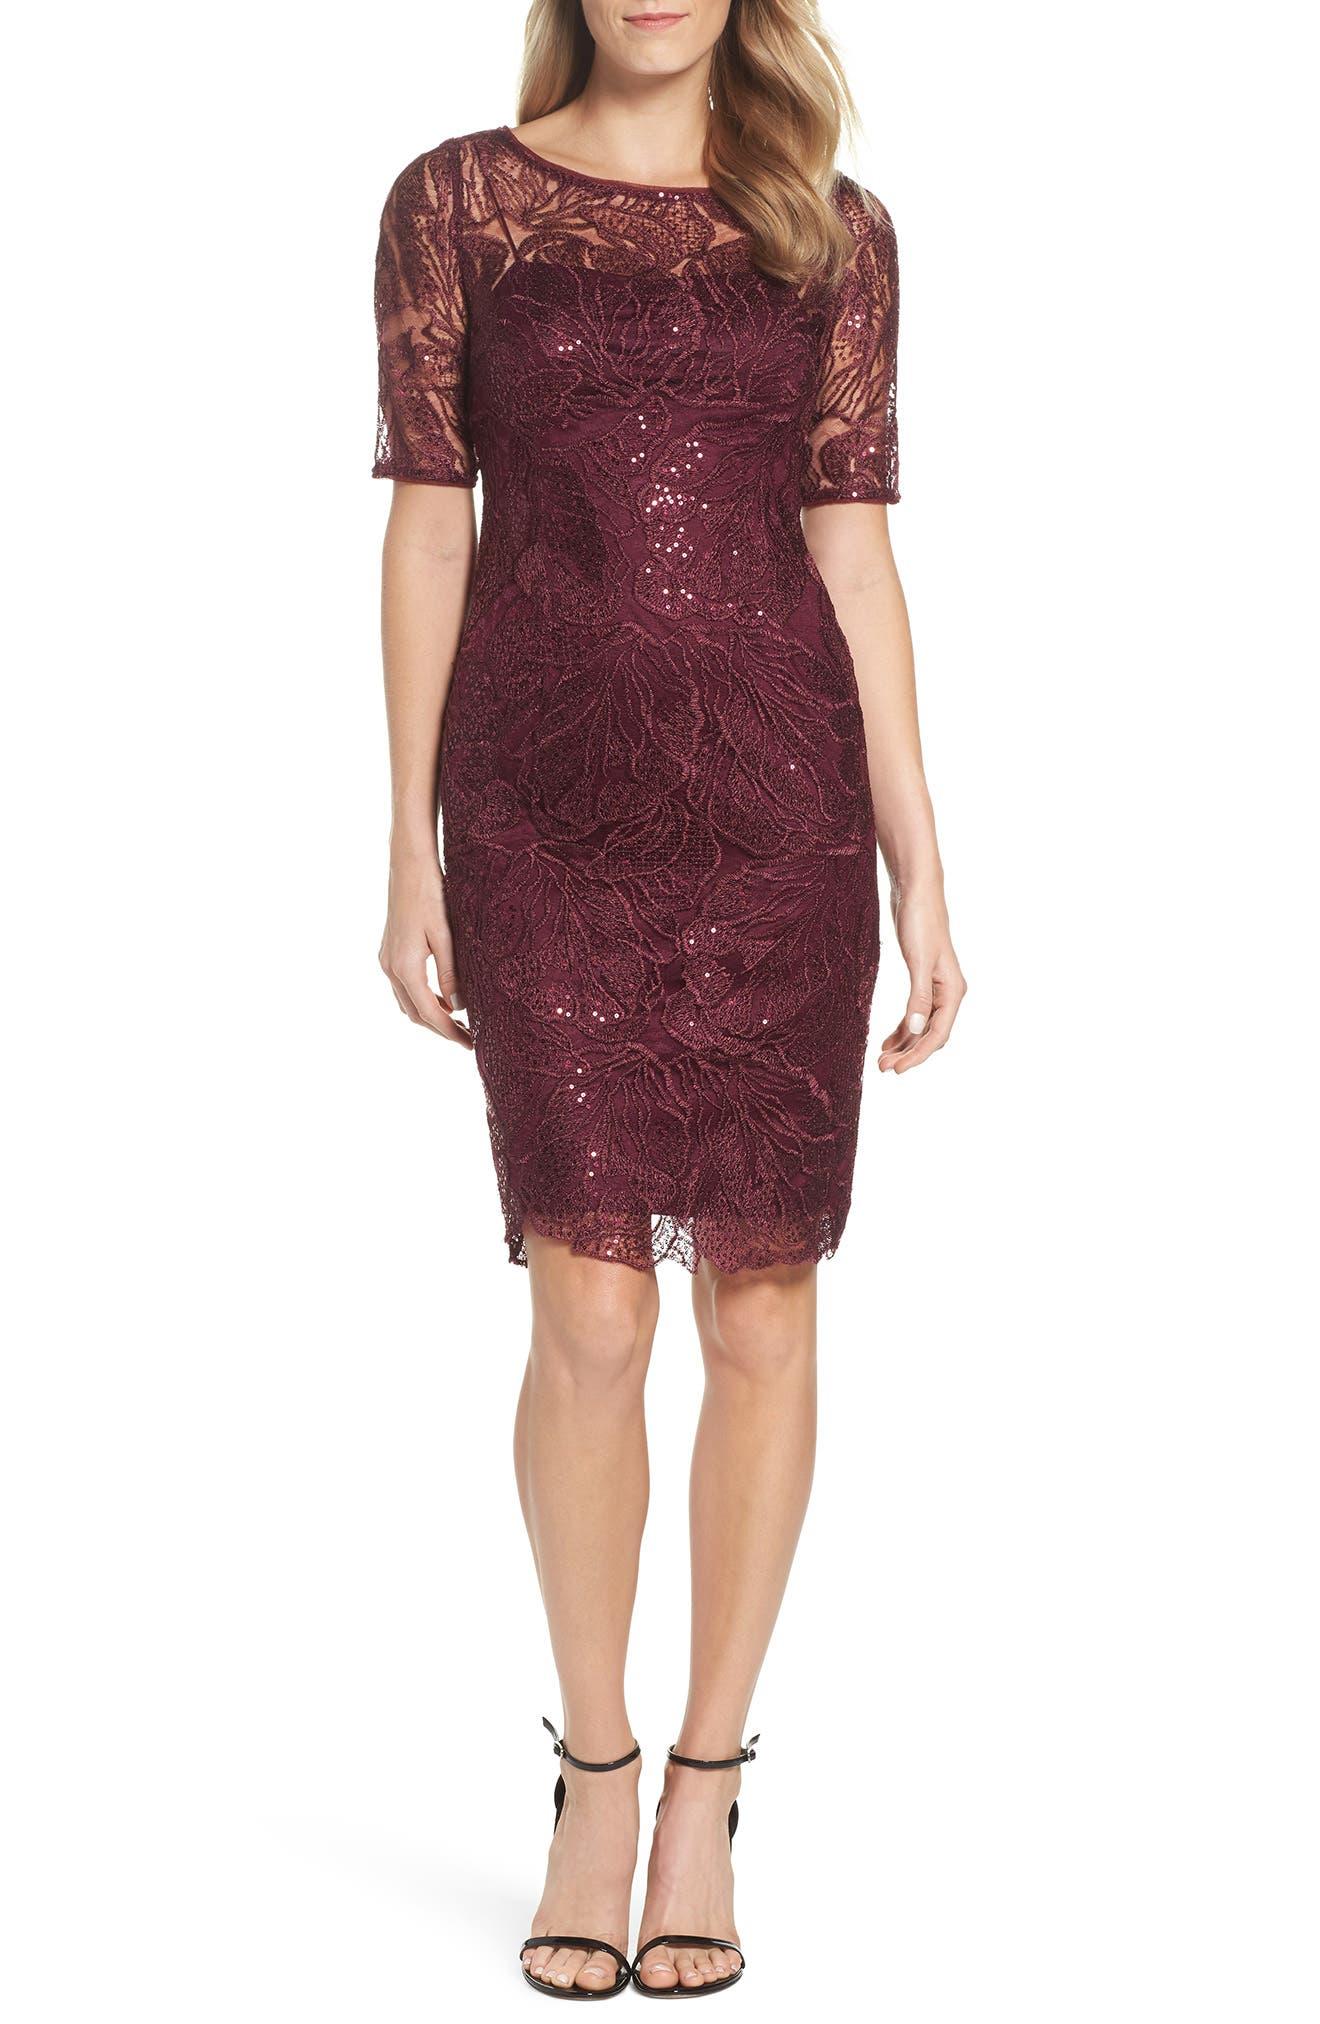 Alternate Image 1 Selected - Adrianna Papell Sequin Embellished Sheath Dress (Regular & Petite)